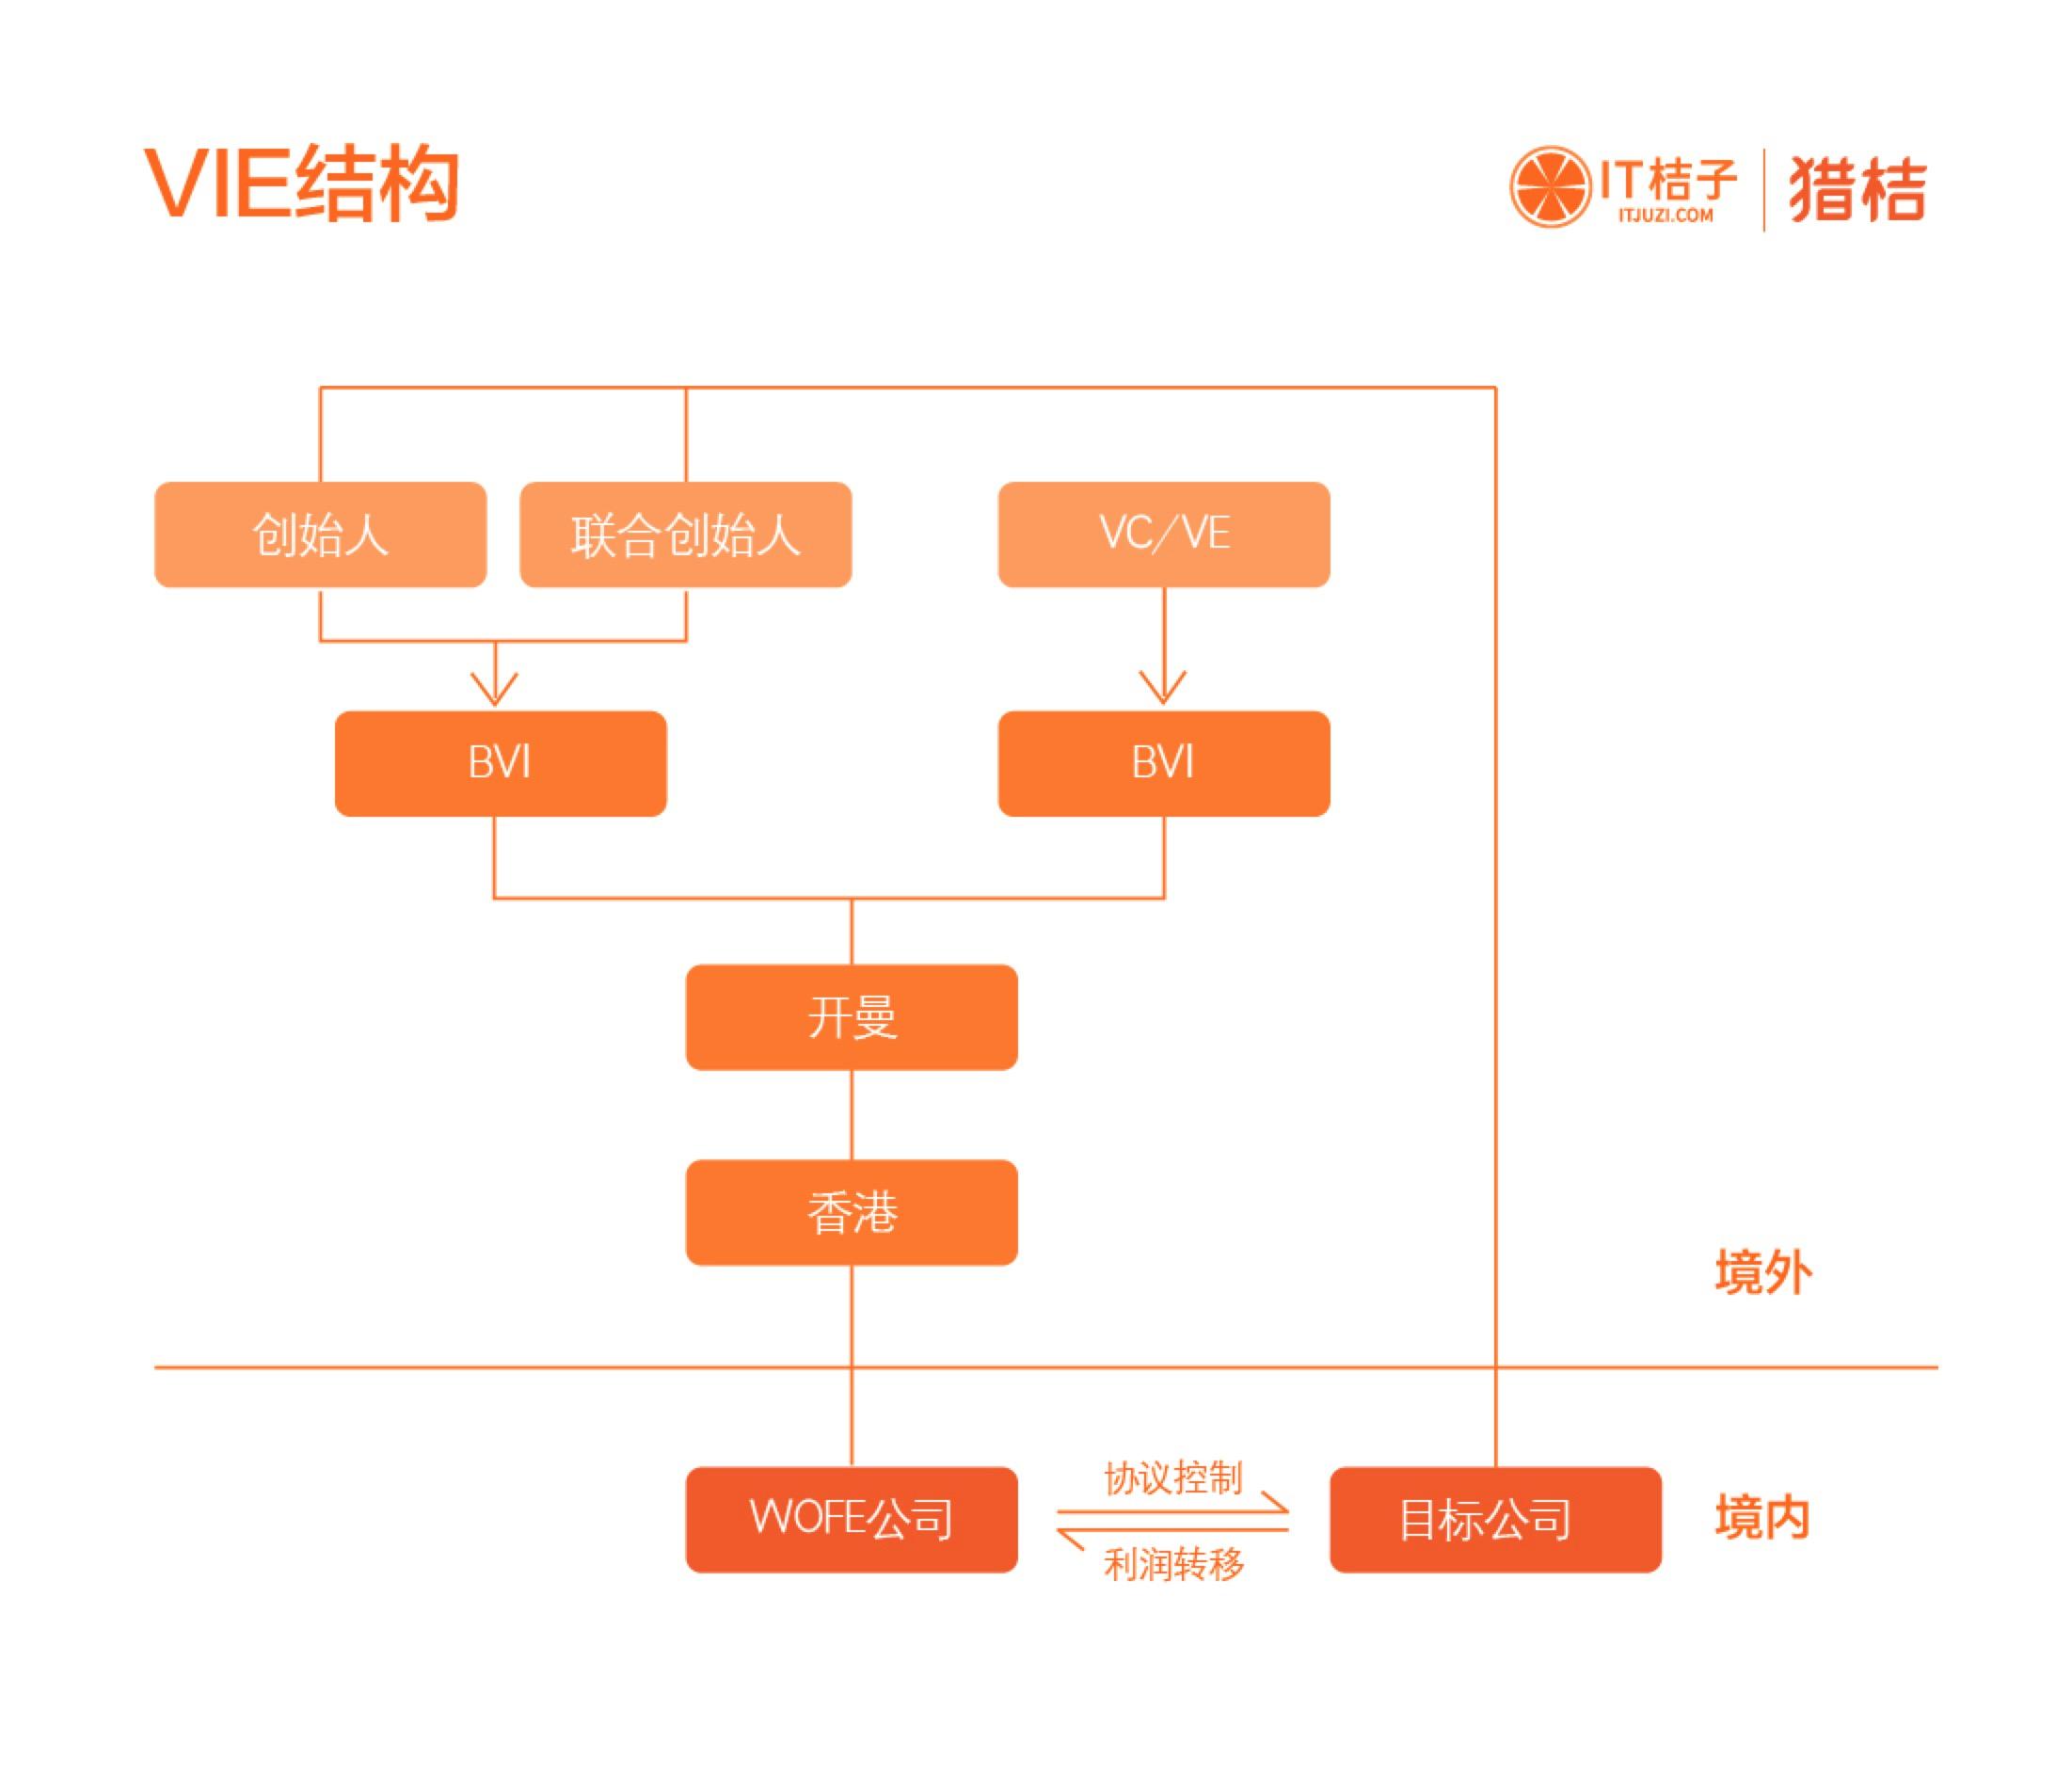 VIE 股權結構模式及BAT股權架構分析-Ai Eureka Moment